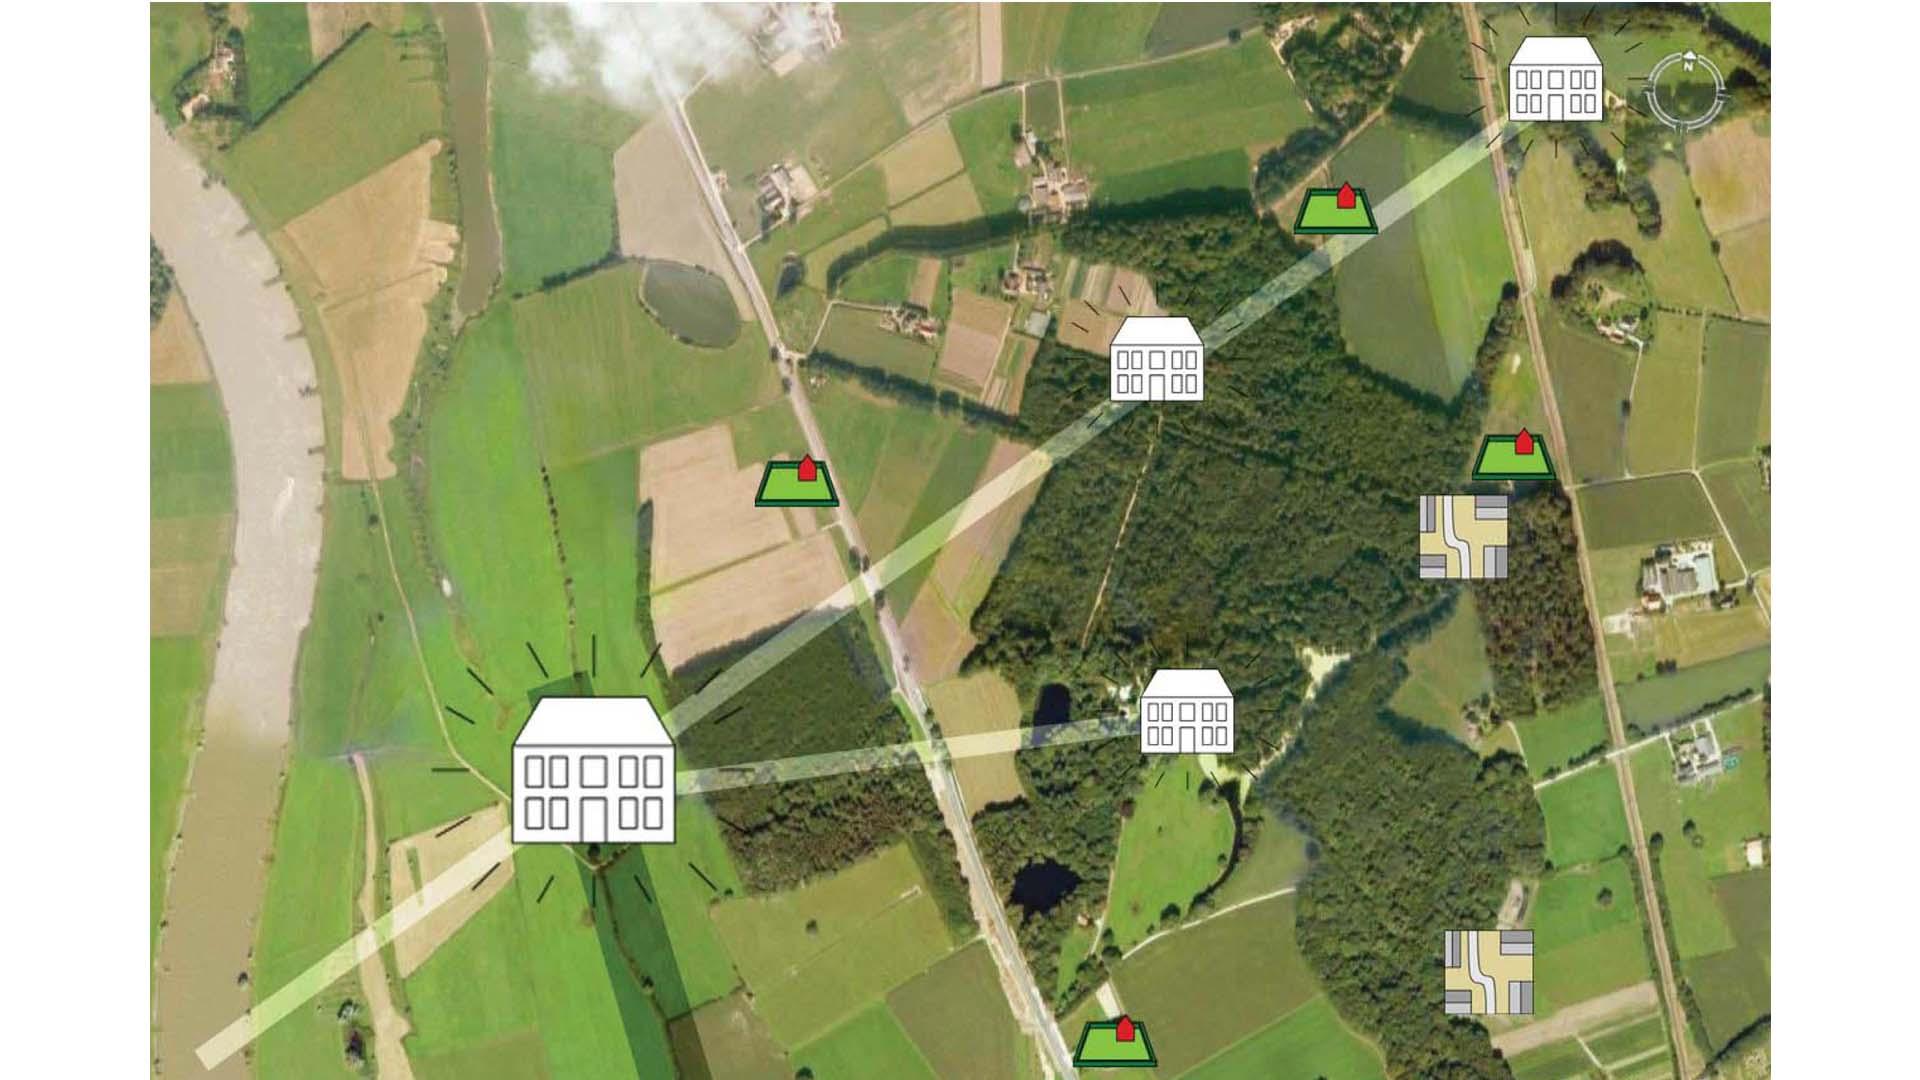 0647_Landgoed Rande Deventer_02